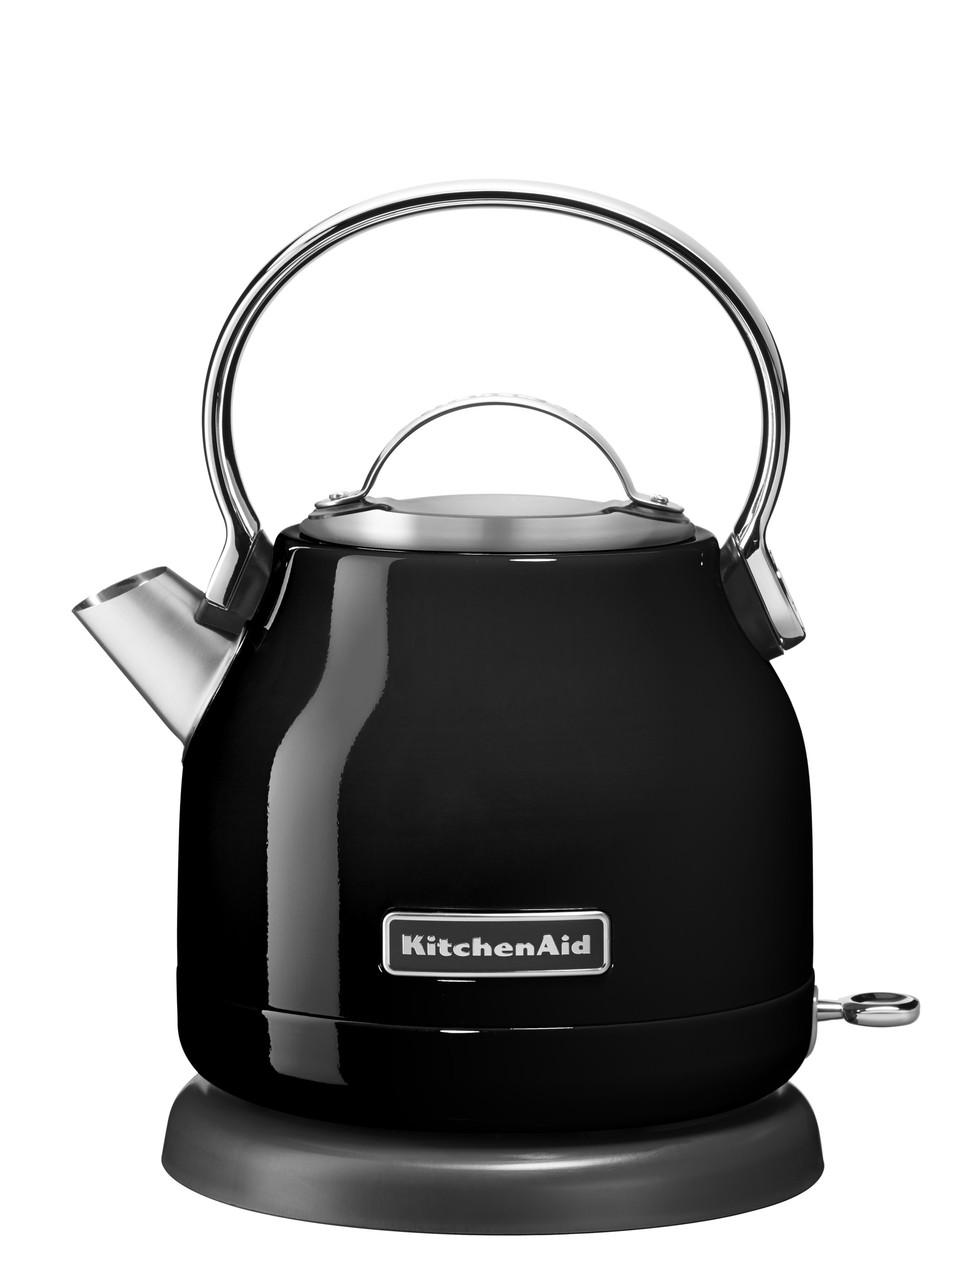 Чайник электрический с фильтром 1.25 л KitchenAid 1.25 L Water Kettle 5KEK1222EOB